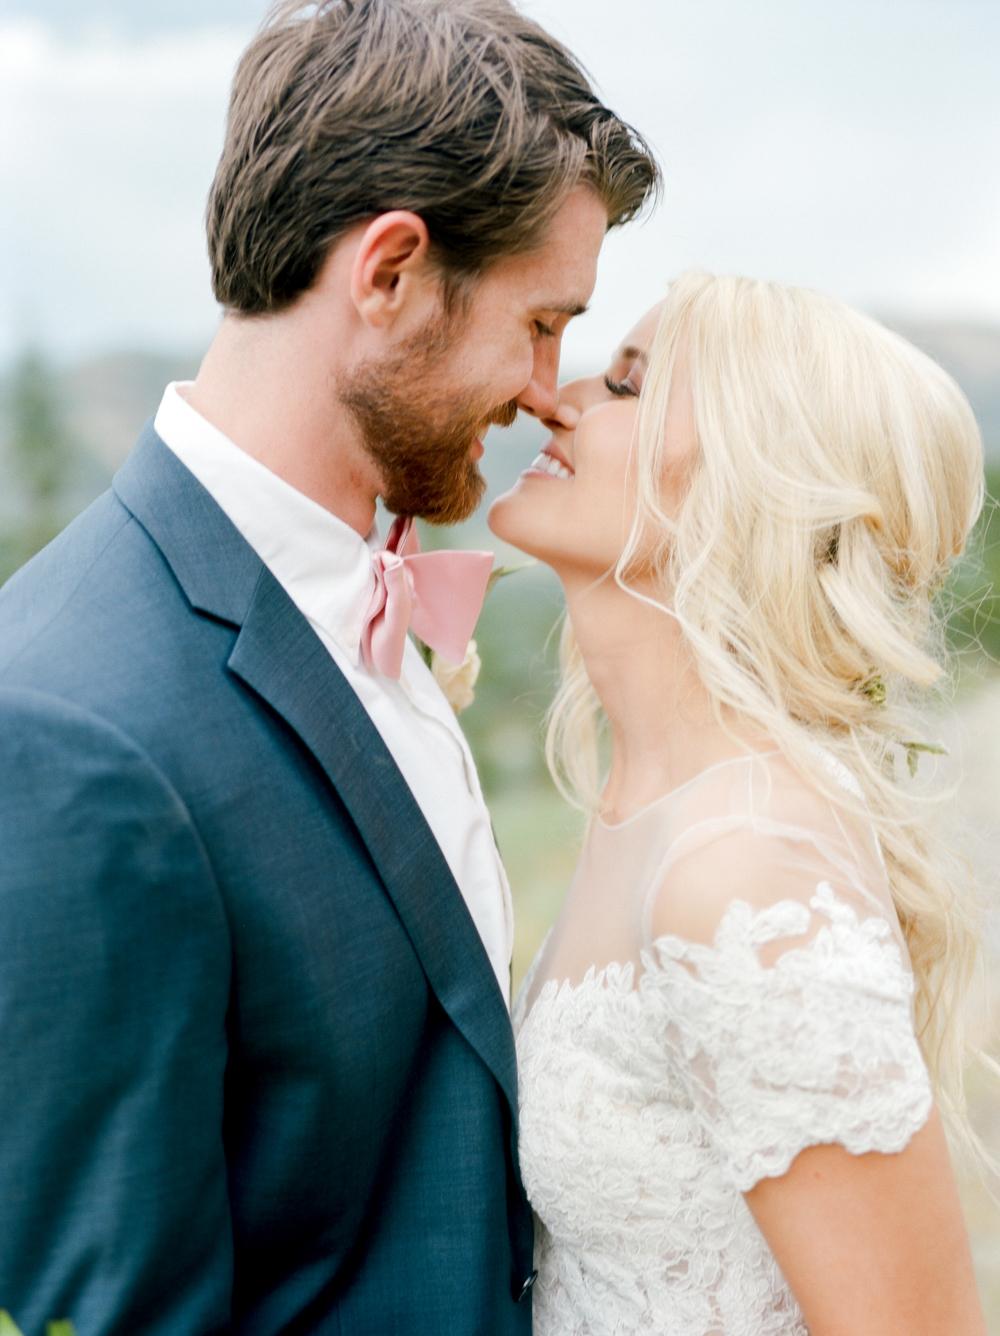 Bostick-Durham-Wedding-494.jpg